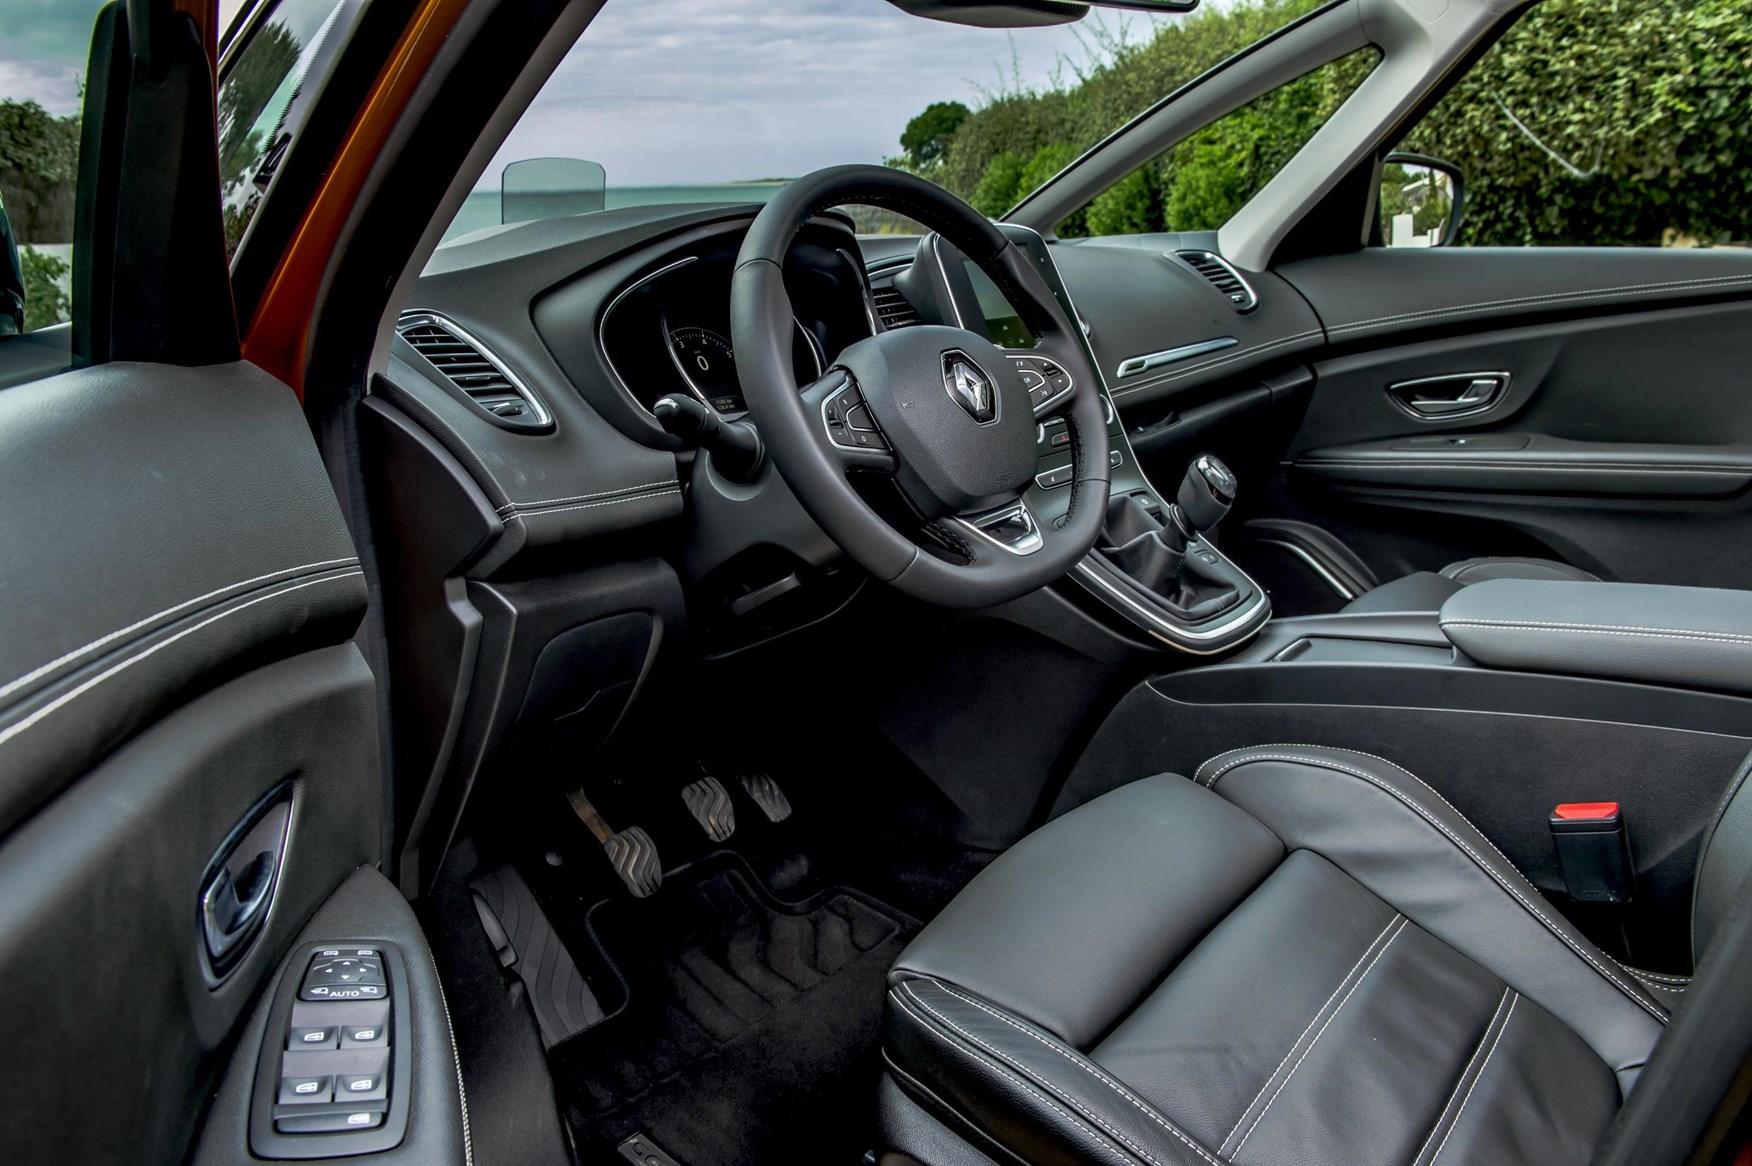 Renault scenic estate 2016 features equipment and for Interior renault scenic